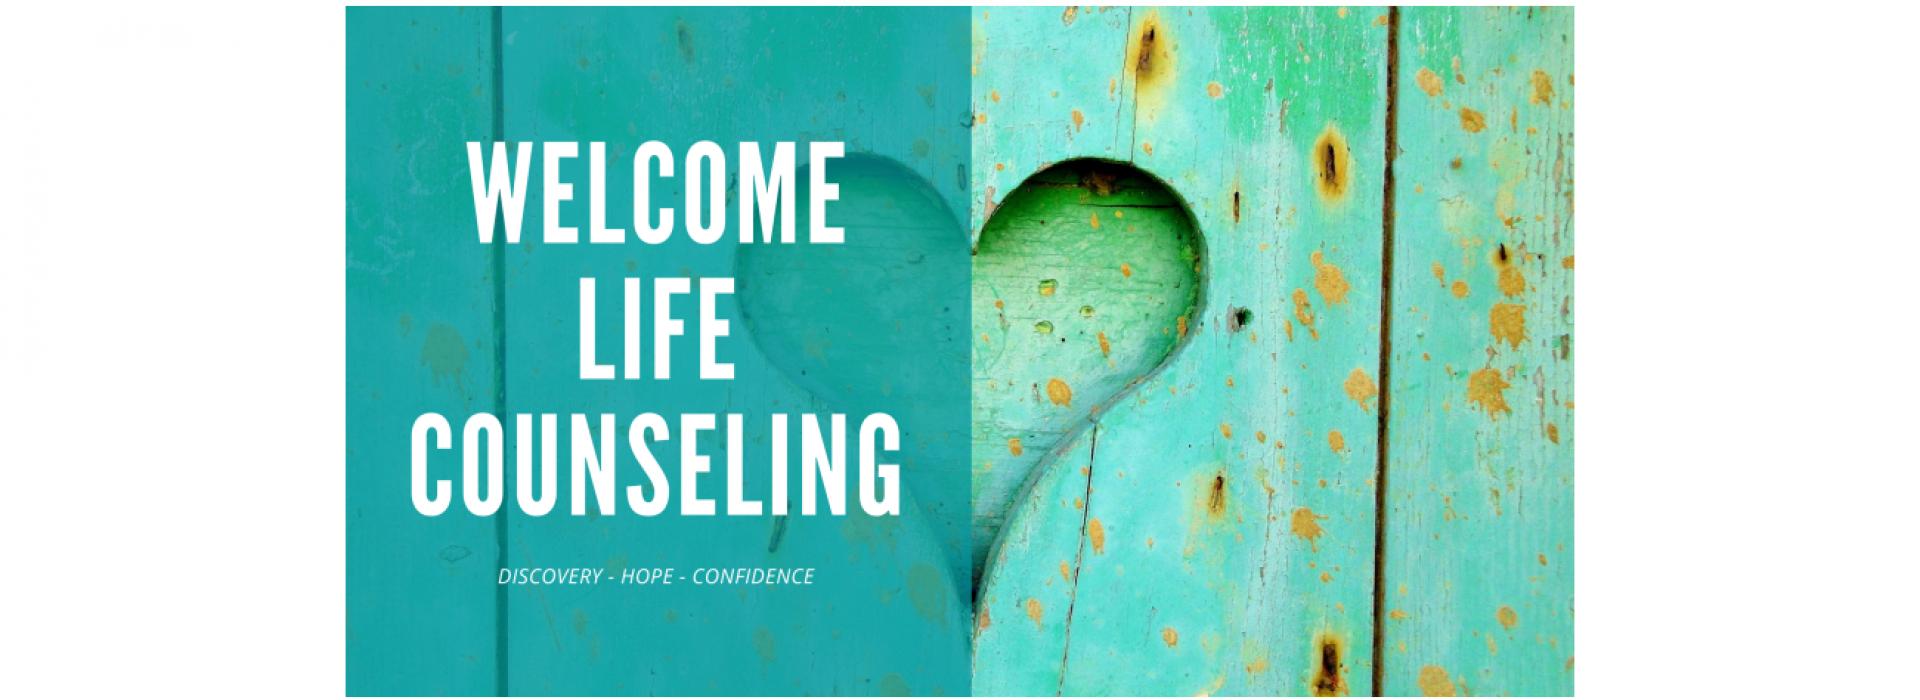 Welcome Life Counseling Alabama & Florida